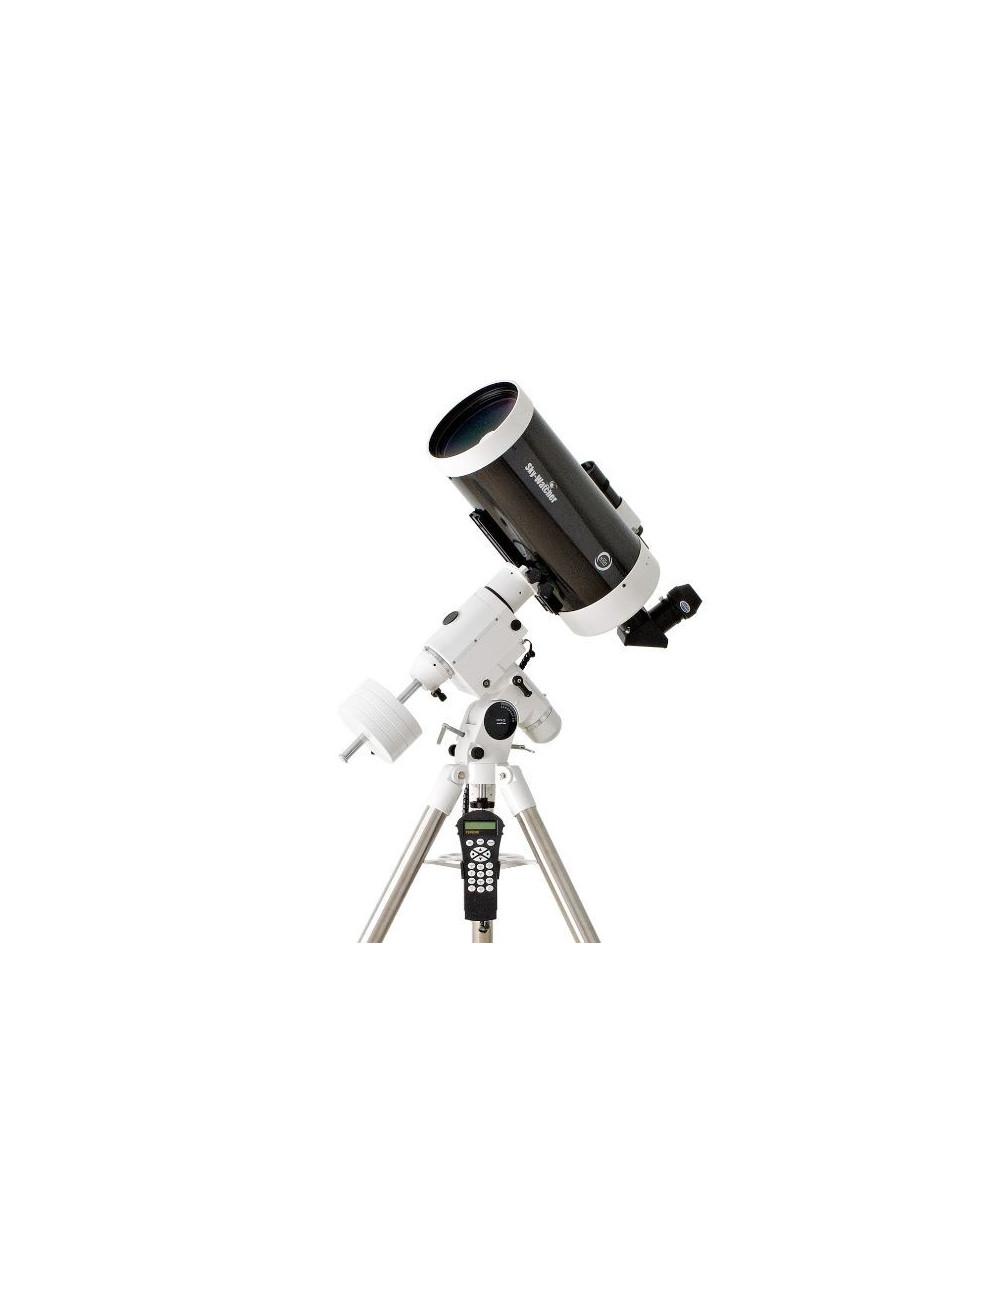 Télescope Sky-Watcher Mak180 Black Diamond sur HEQ5 Pro Go-To